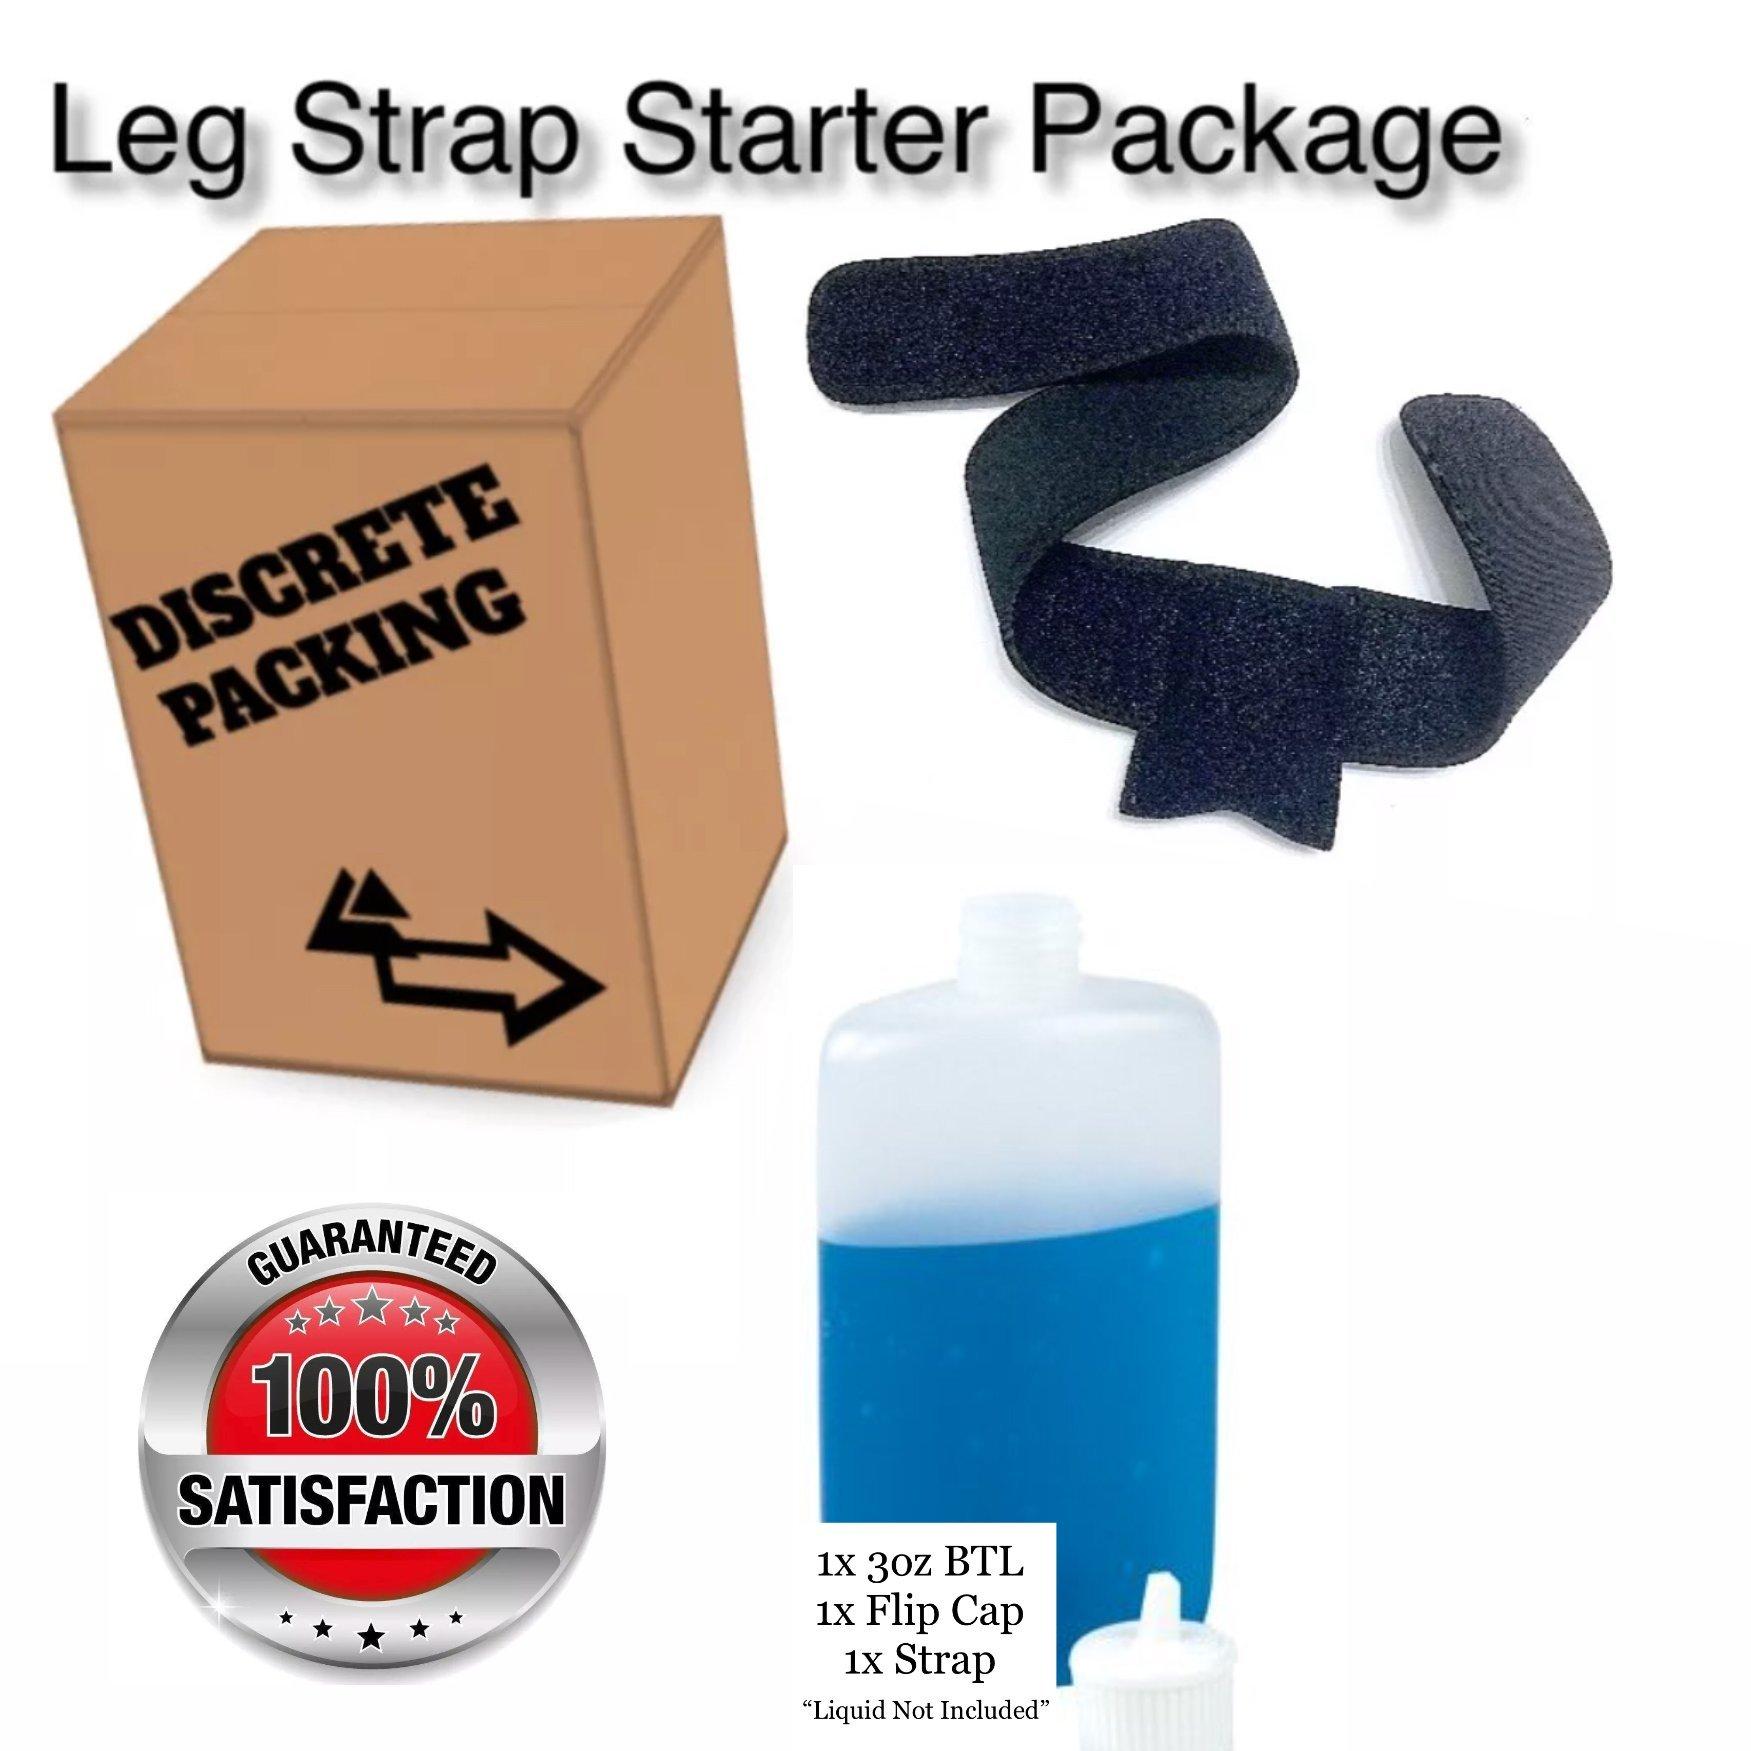 IVIBED Hidden Pocket Leg Strap Combo Pack 1pc-4pc Speak Easy Hiking Leg Belt 1st AID Camping Hiking (2pc Black Strap + Bottle)